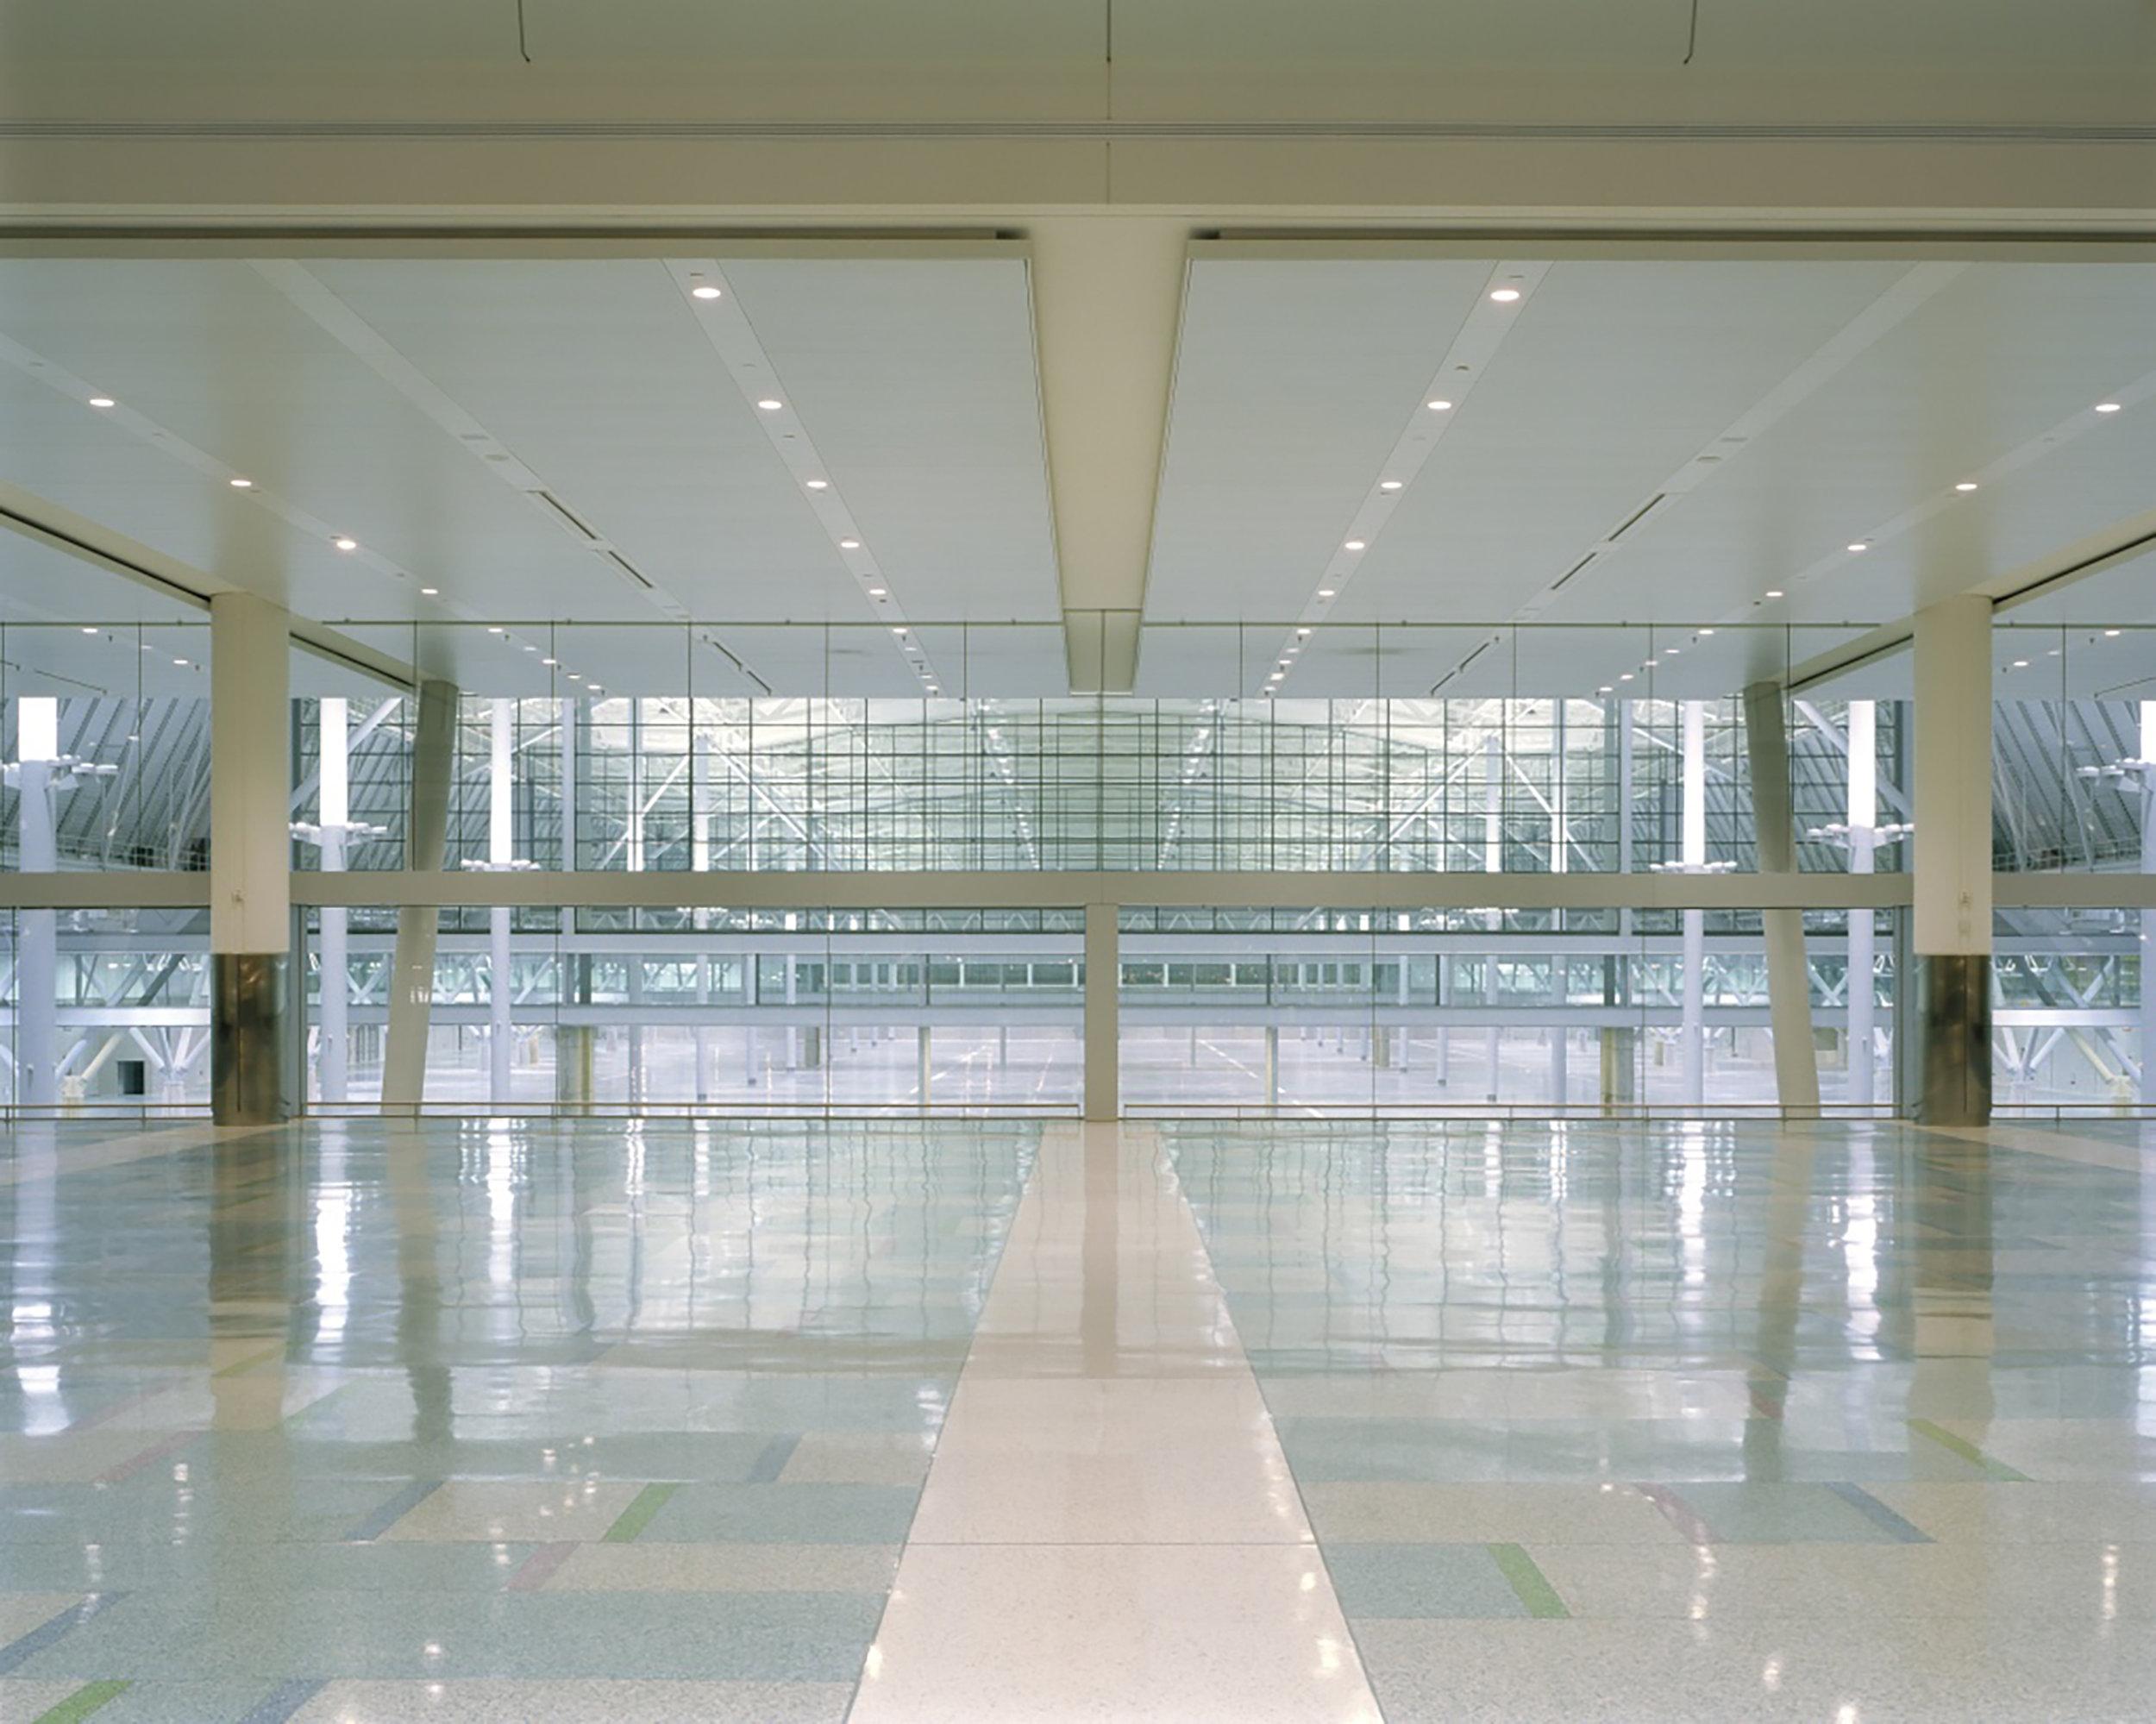 The Boston Convention & Exhibition Center designed with Rafael Viñoly